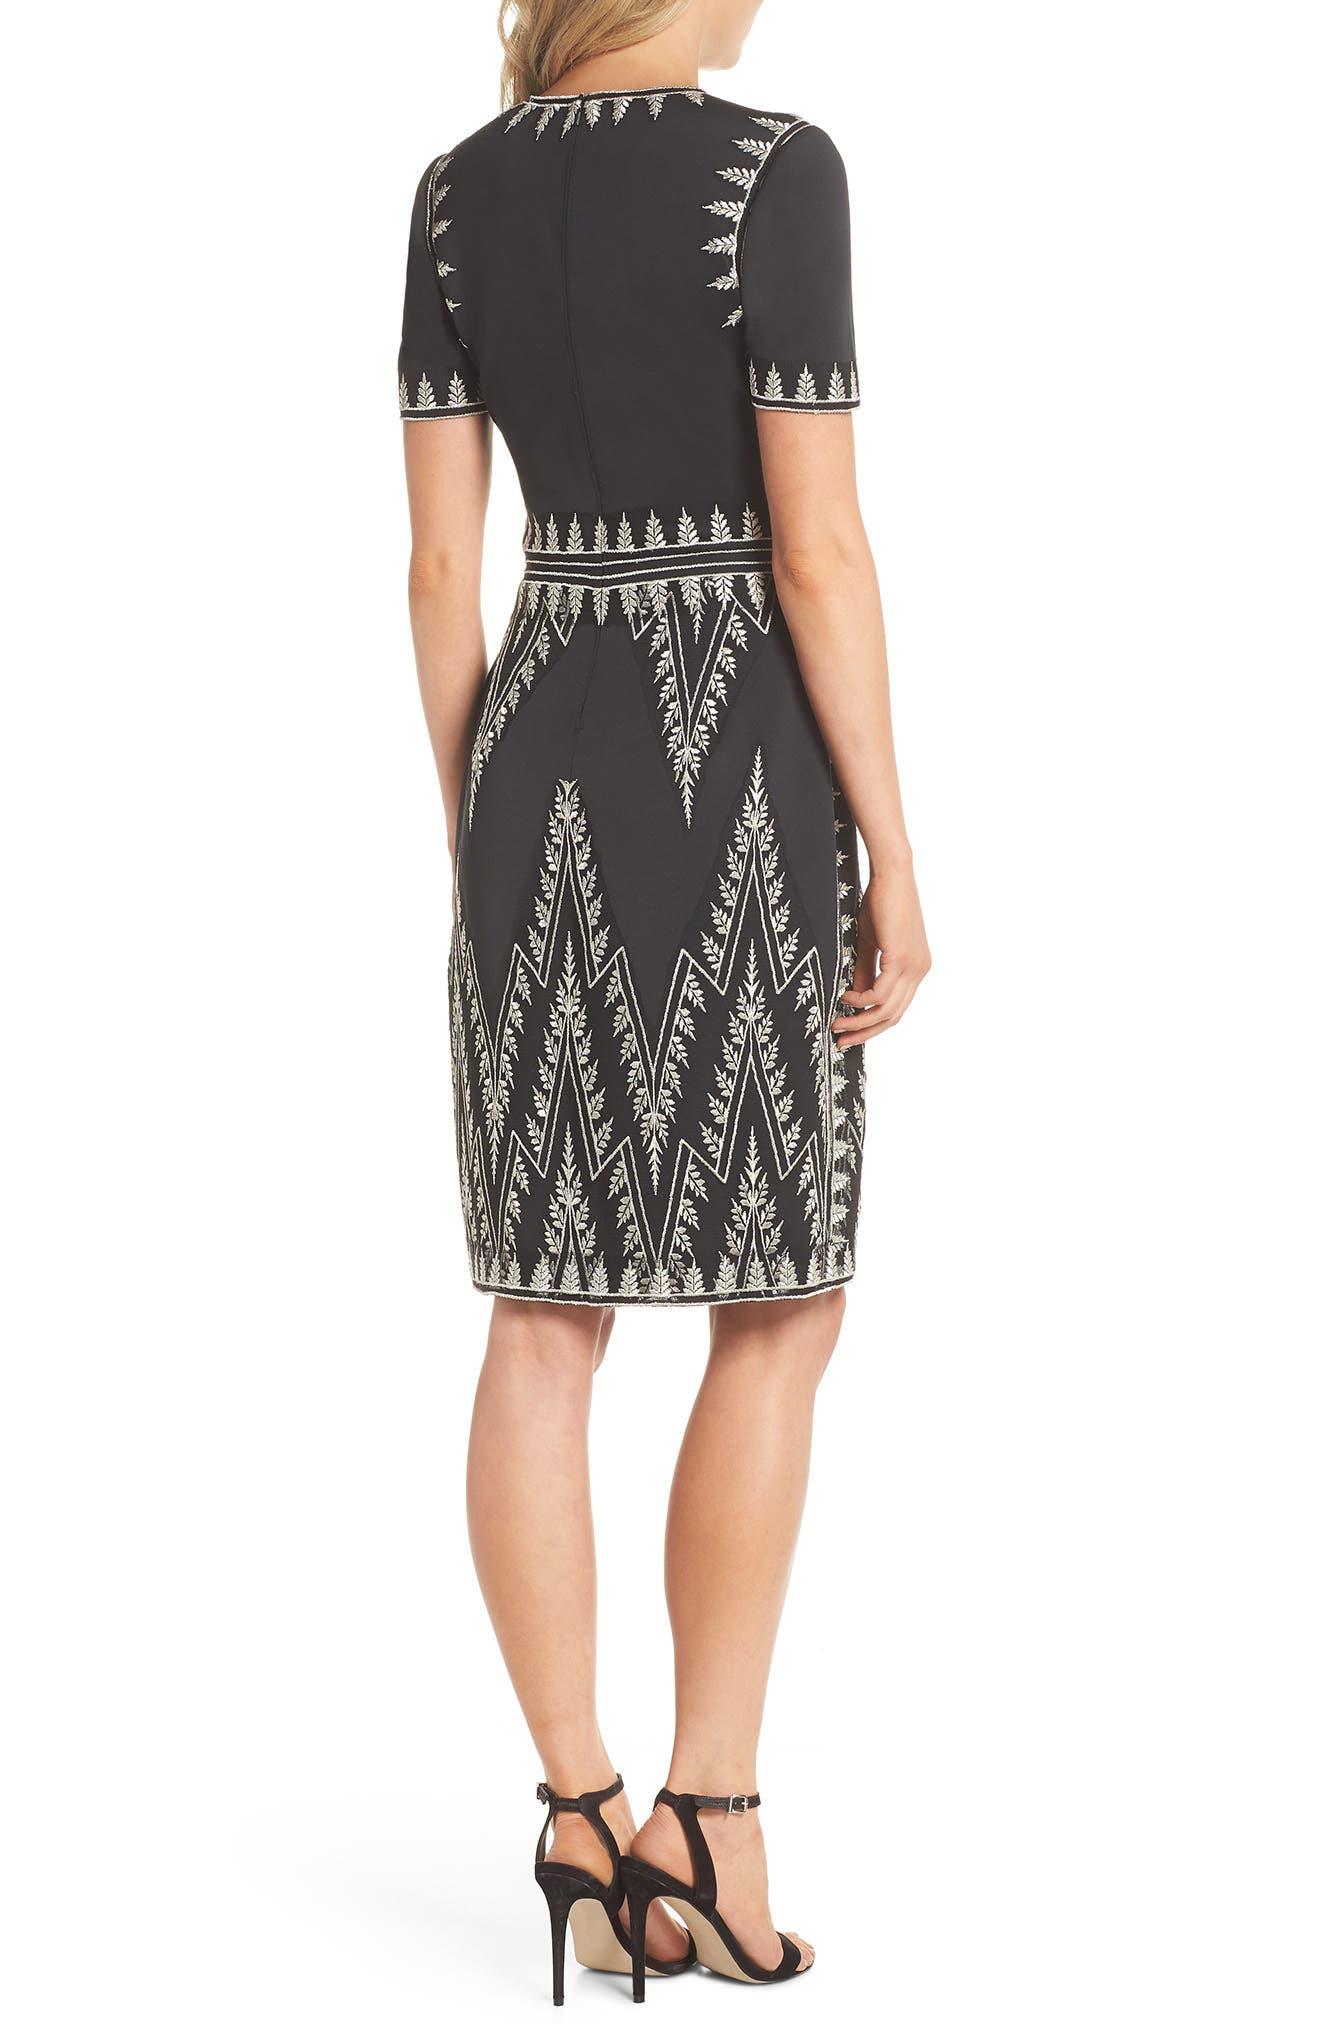 Embroidered Chevron Dress,                             Alternate thumbnail 2, color,                             BLACK/ SILVER